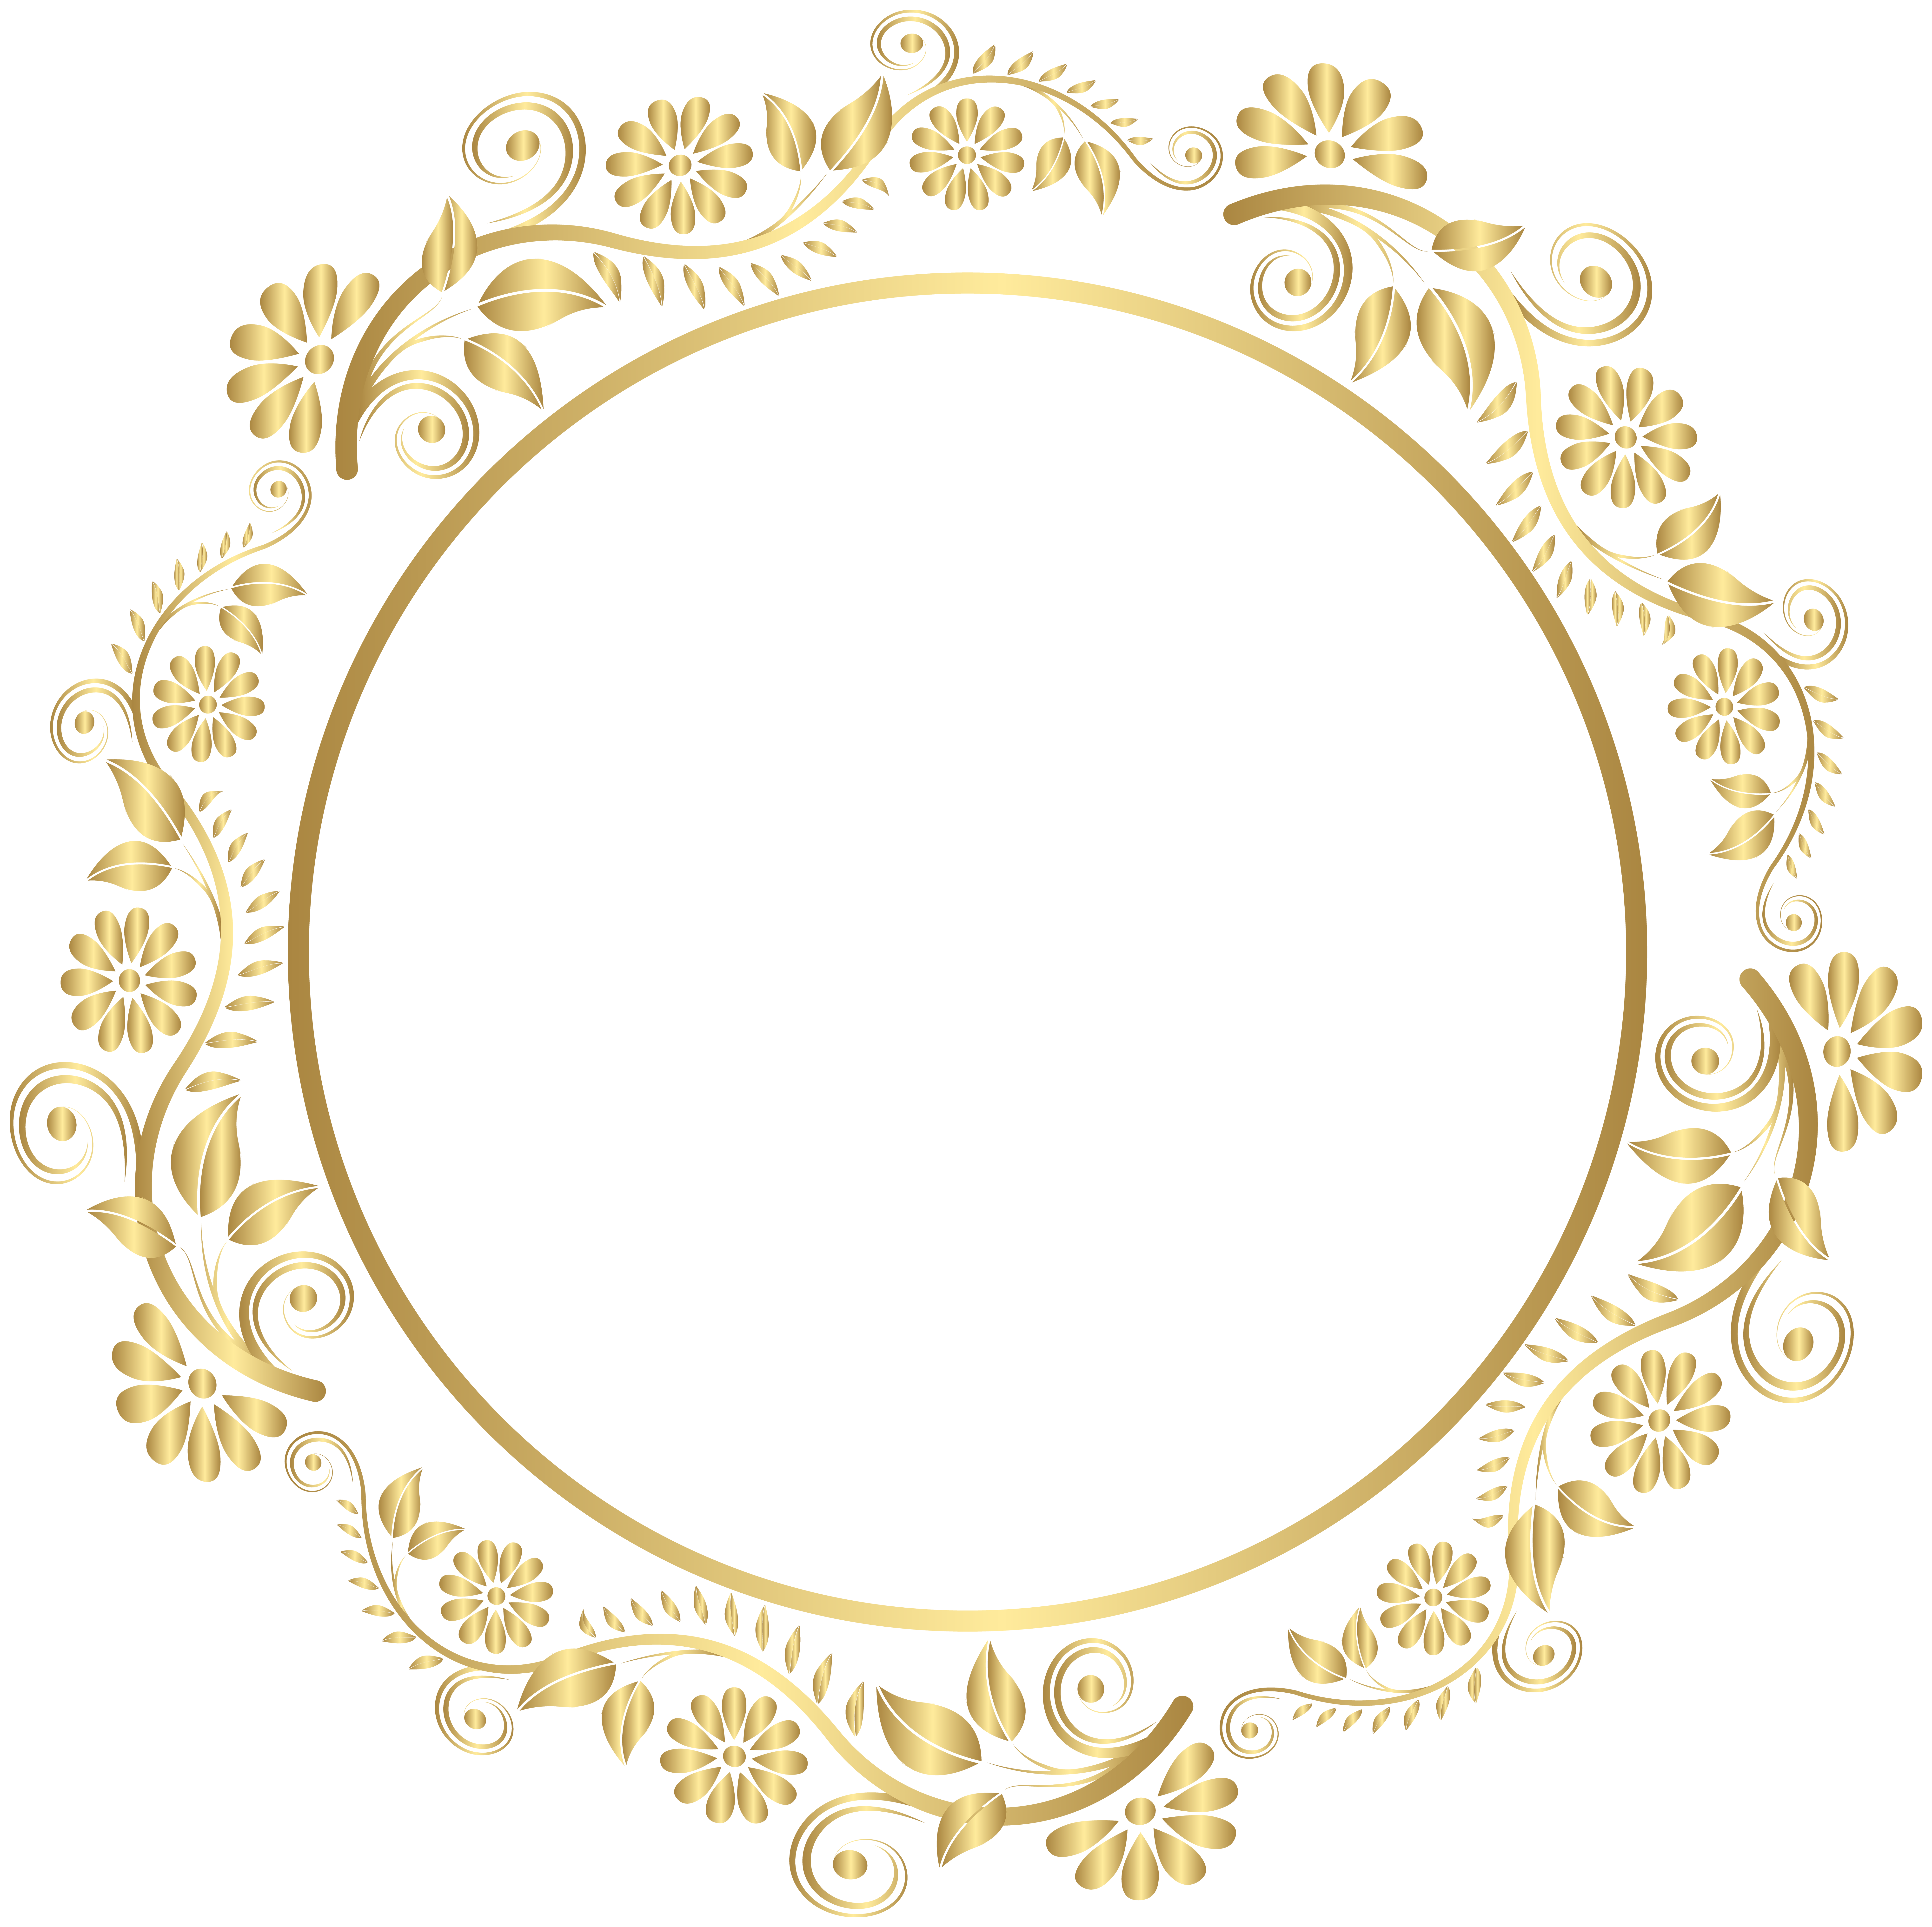 8019x8000 Round Gold Border Frame Deco Png Clip Artu200b Gallery Yopriceville